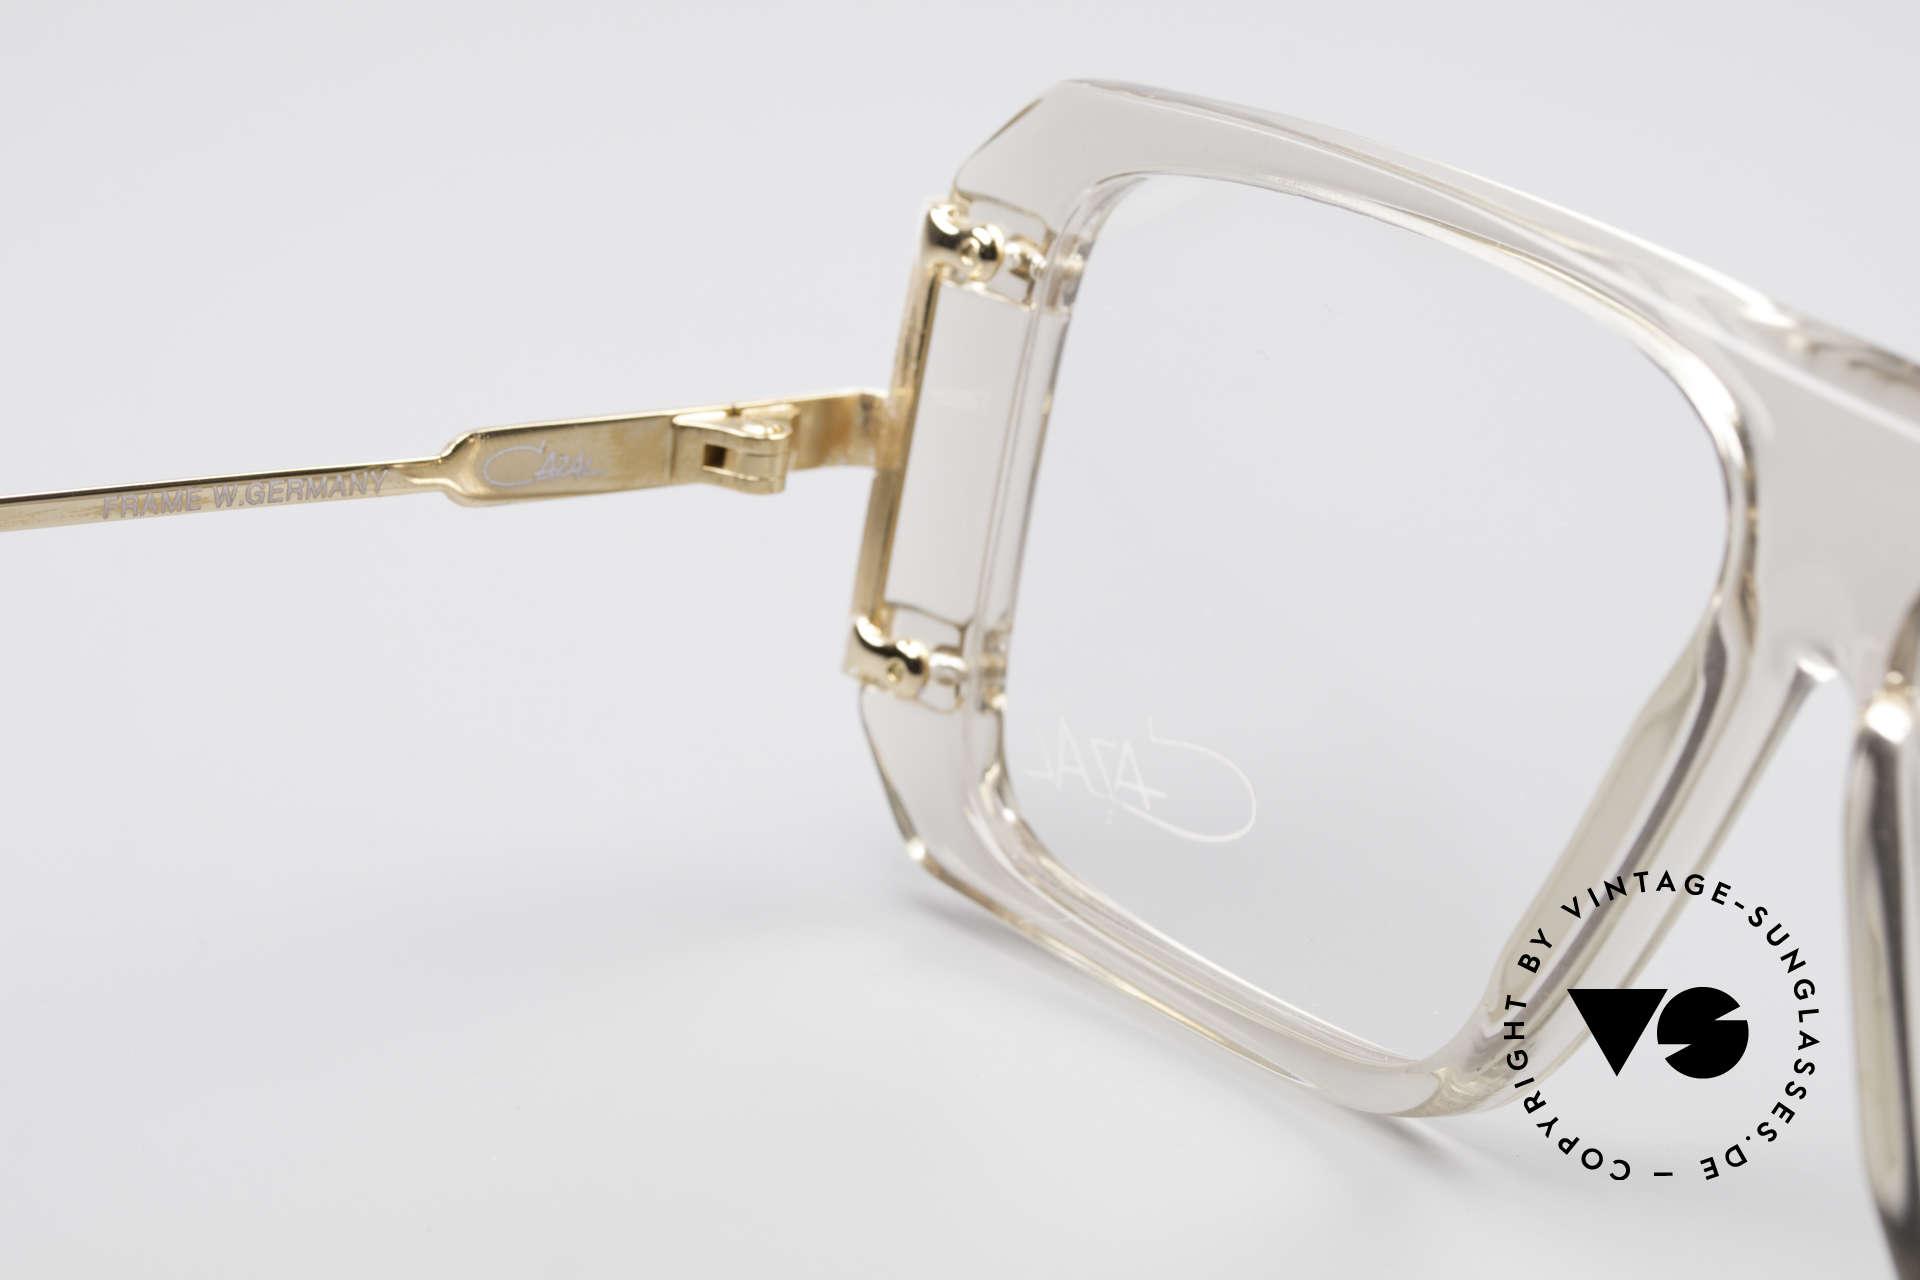 Cazal 633 Vintage Celebrity Eyeglasses, also worn by Rihanna in 2010 (celebrity eyeglasses), Made for Men